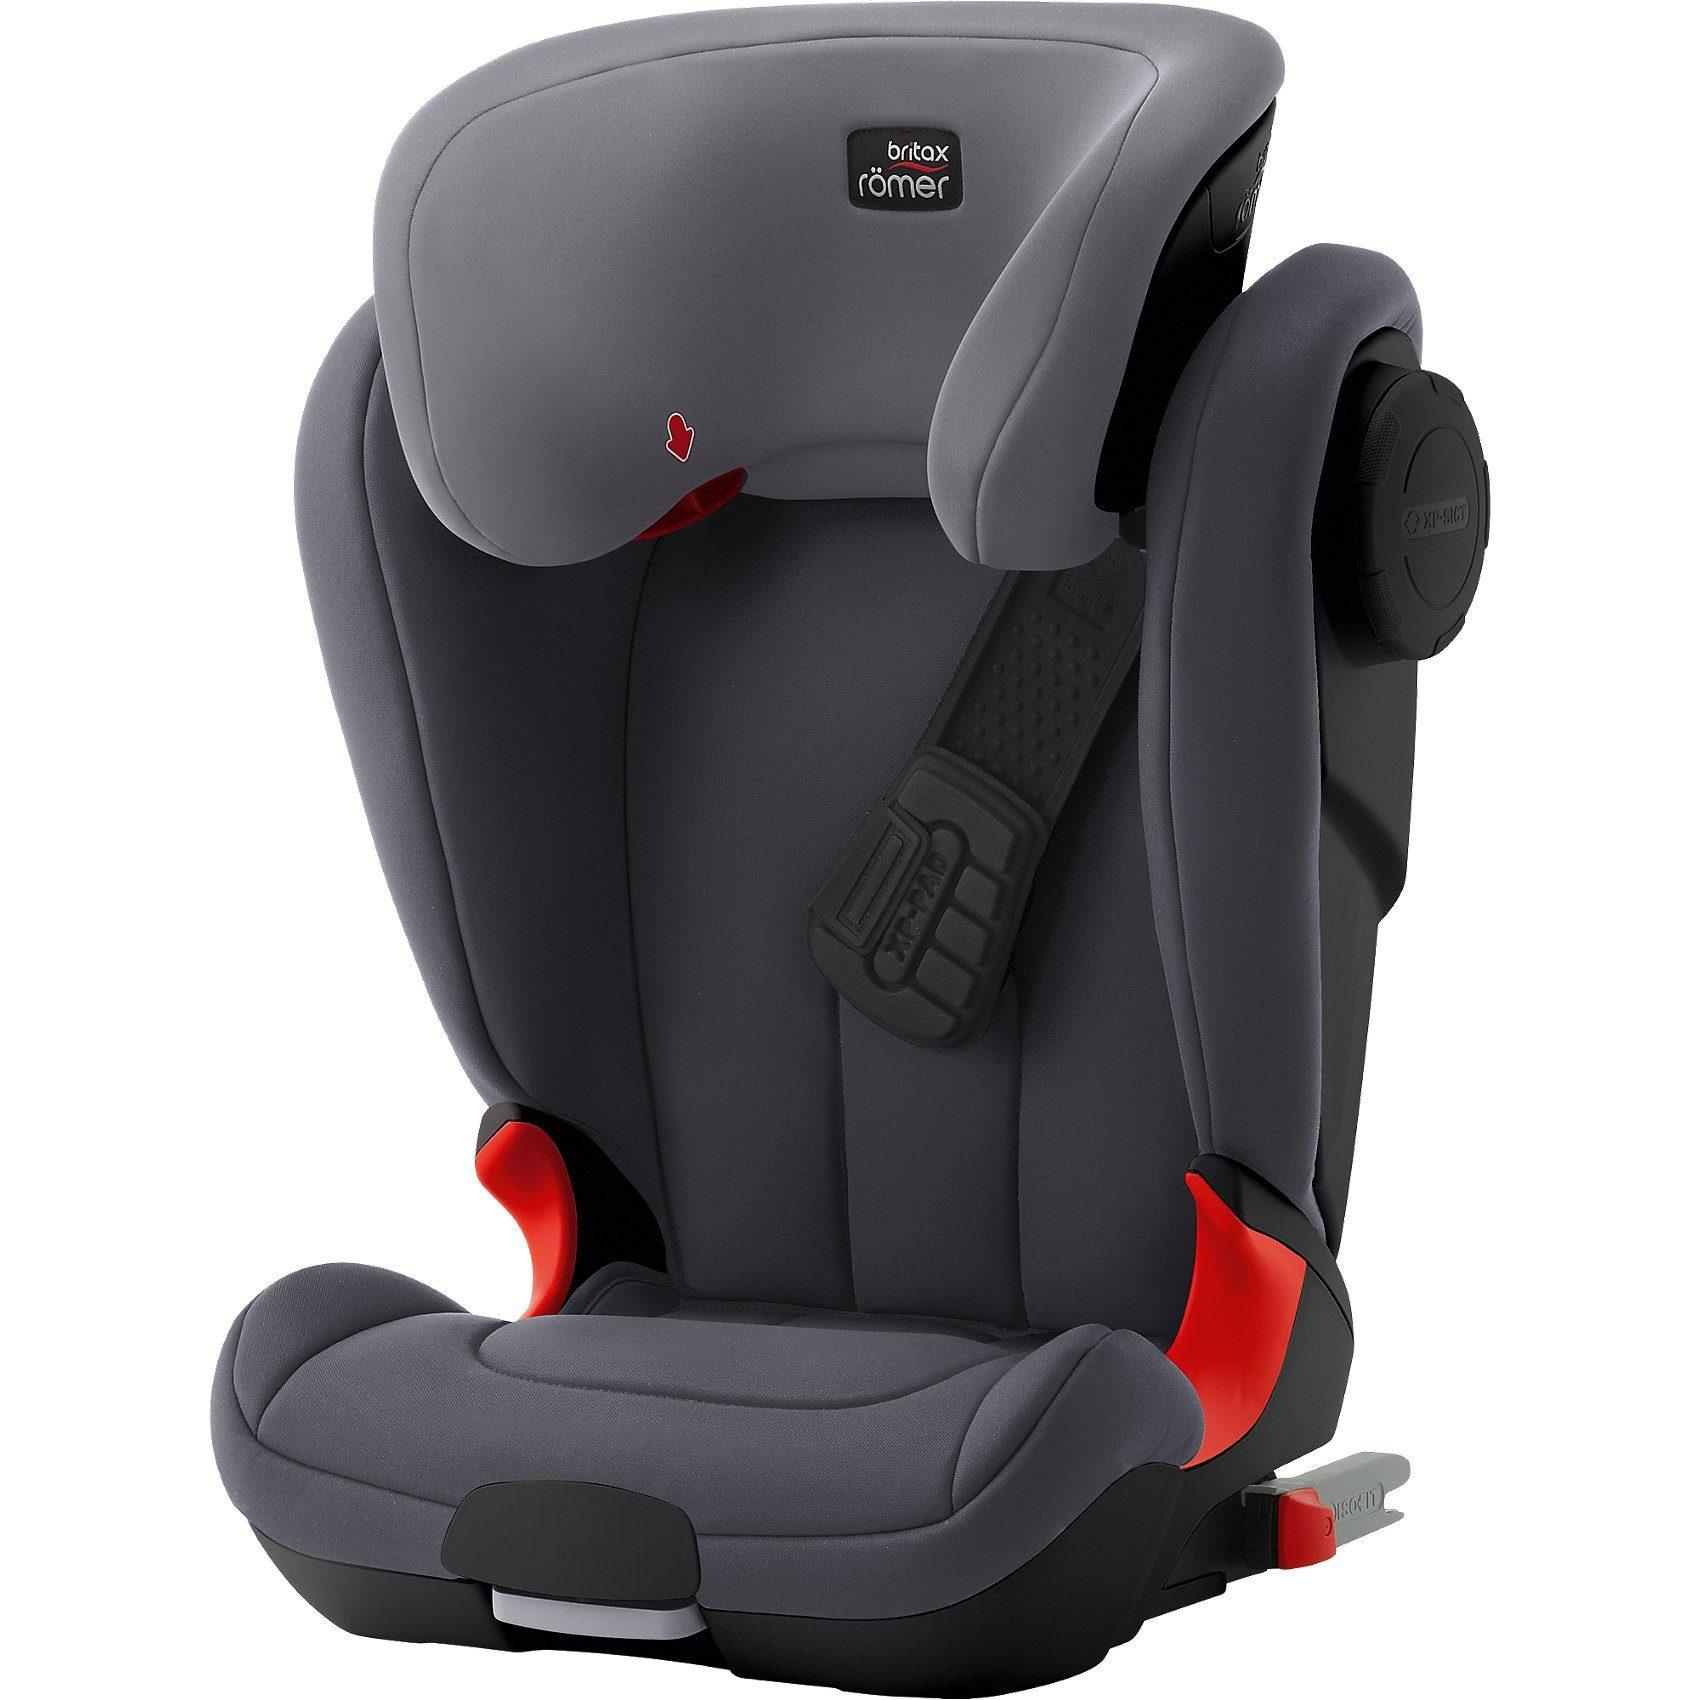 Britax Auto-Kindersitz Kidfix XP SICT, Black Series, Storm Grey, 20